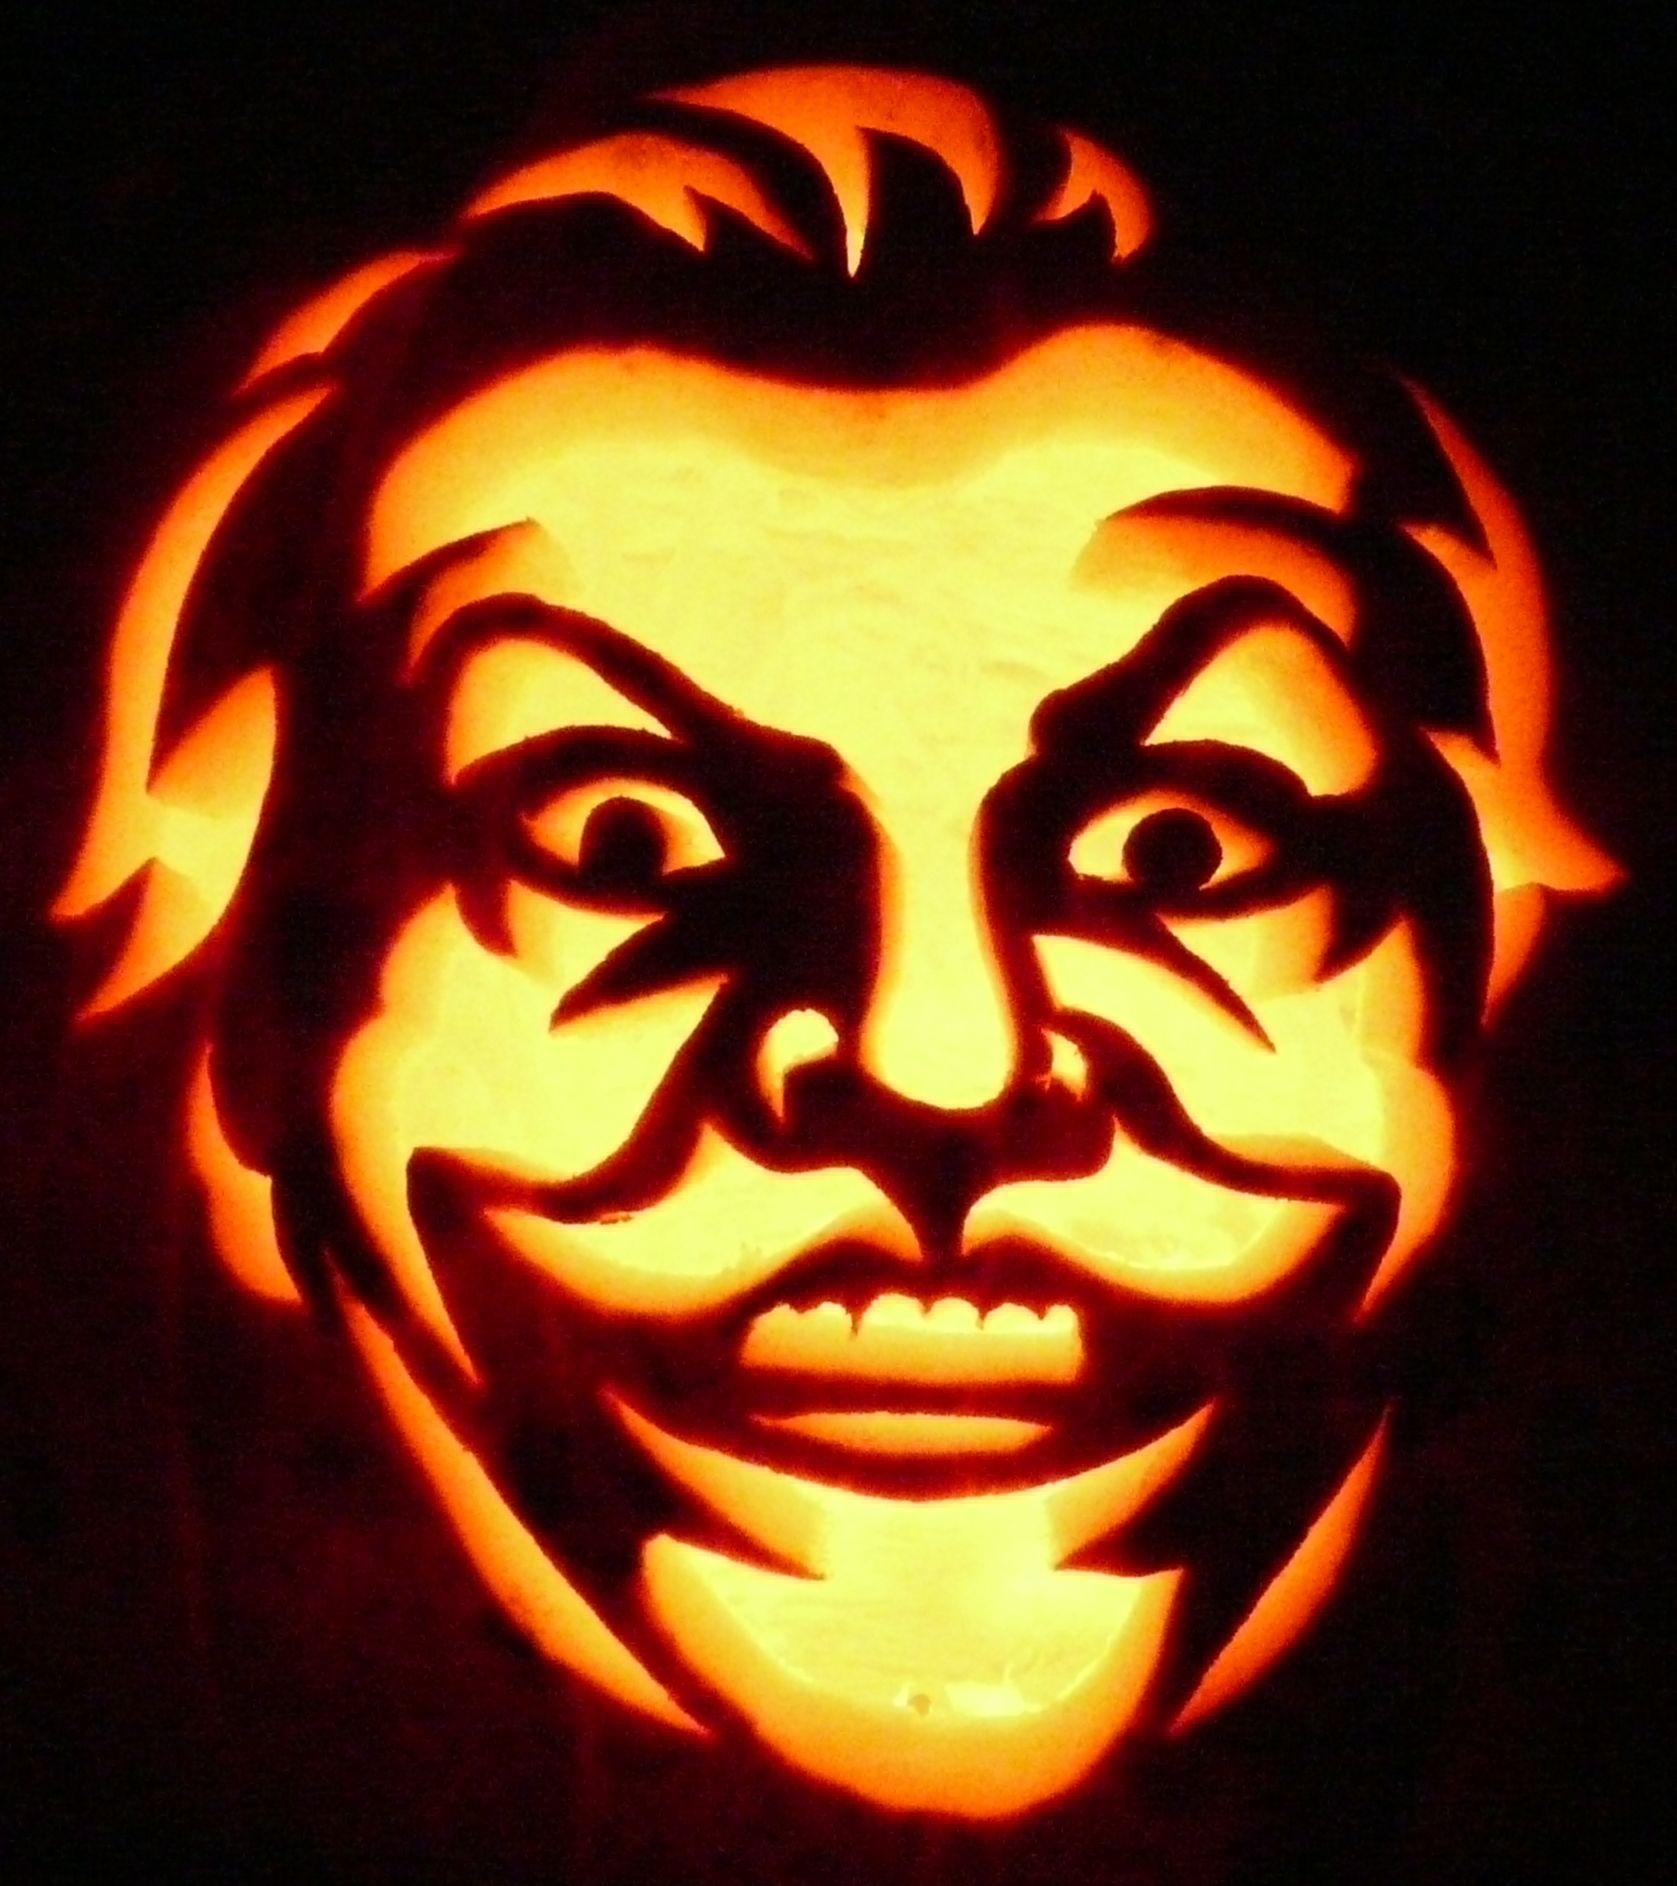 Carved Pumpkin- Jack Nicholson Joker | Pumpkin Carvings at Ken's ...